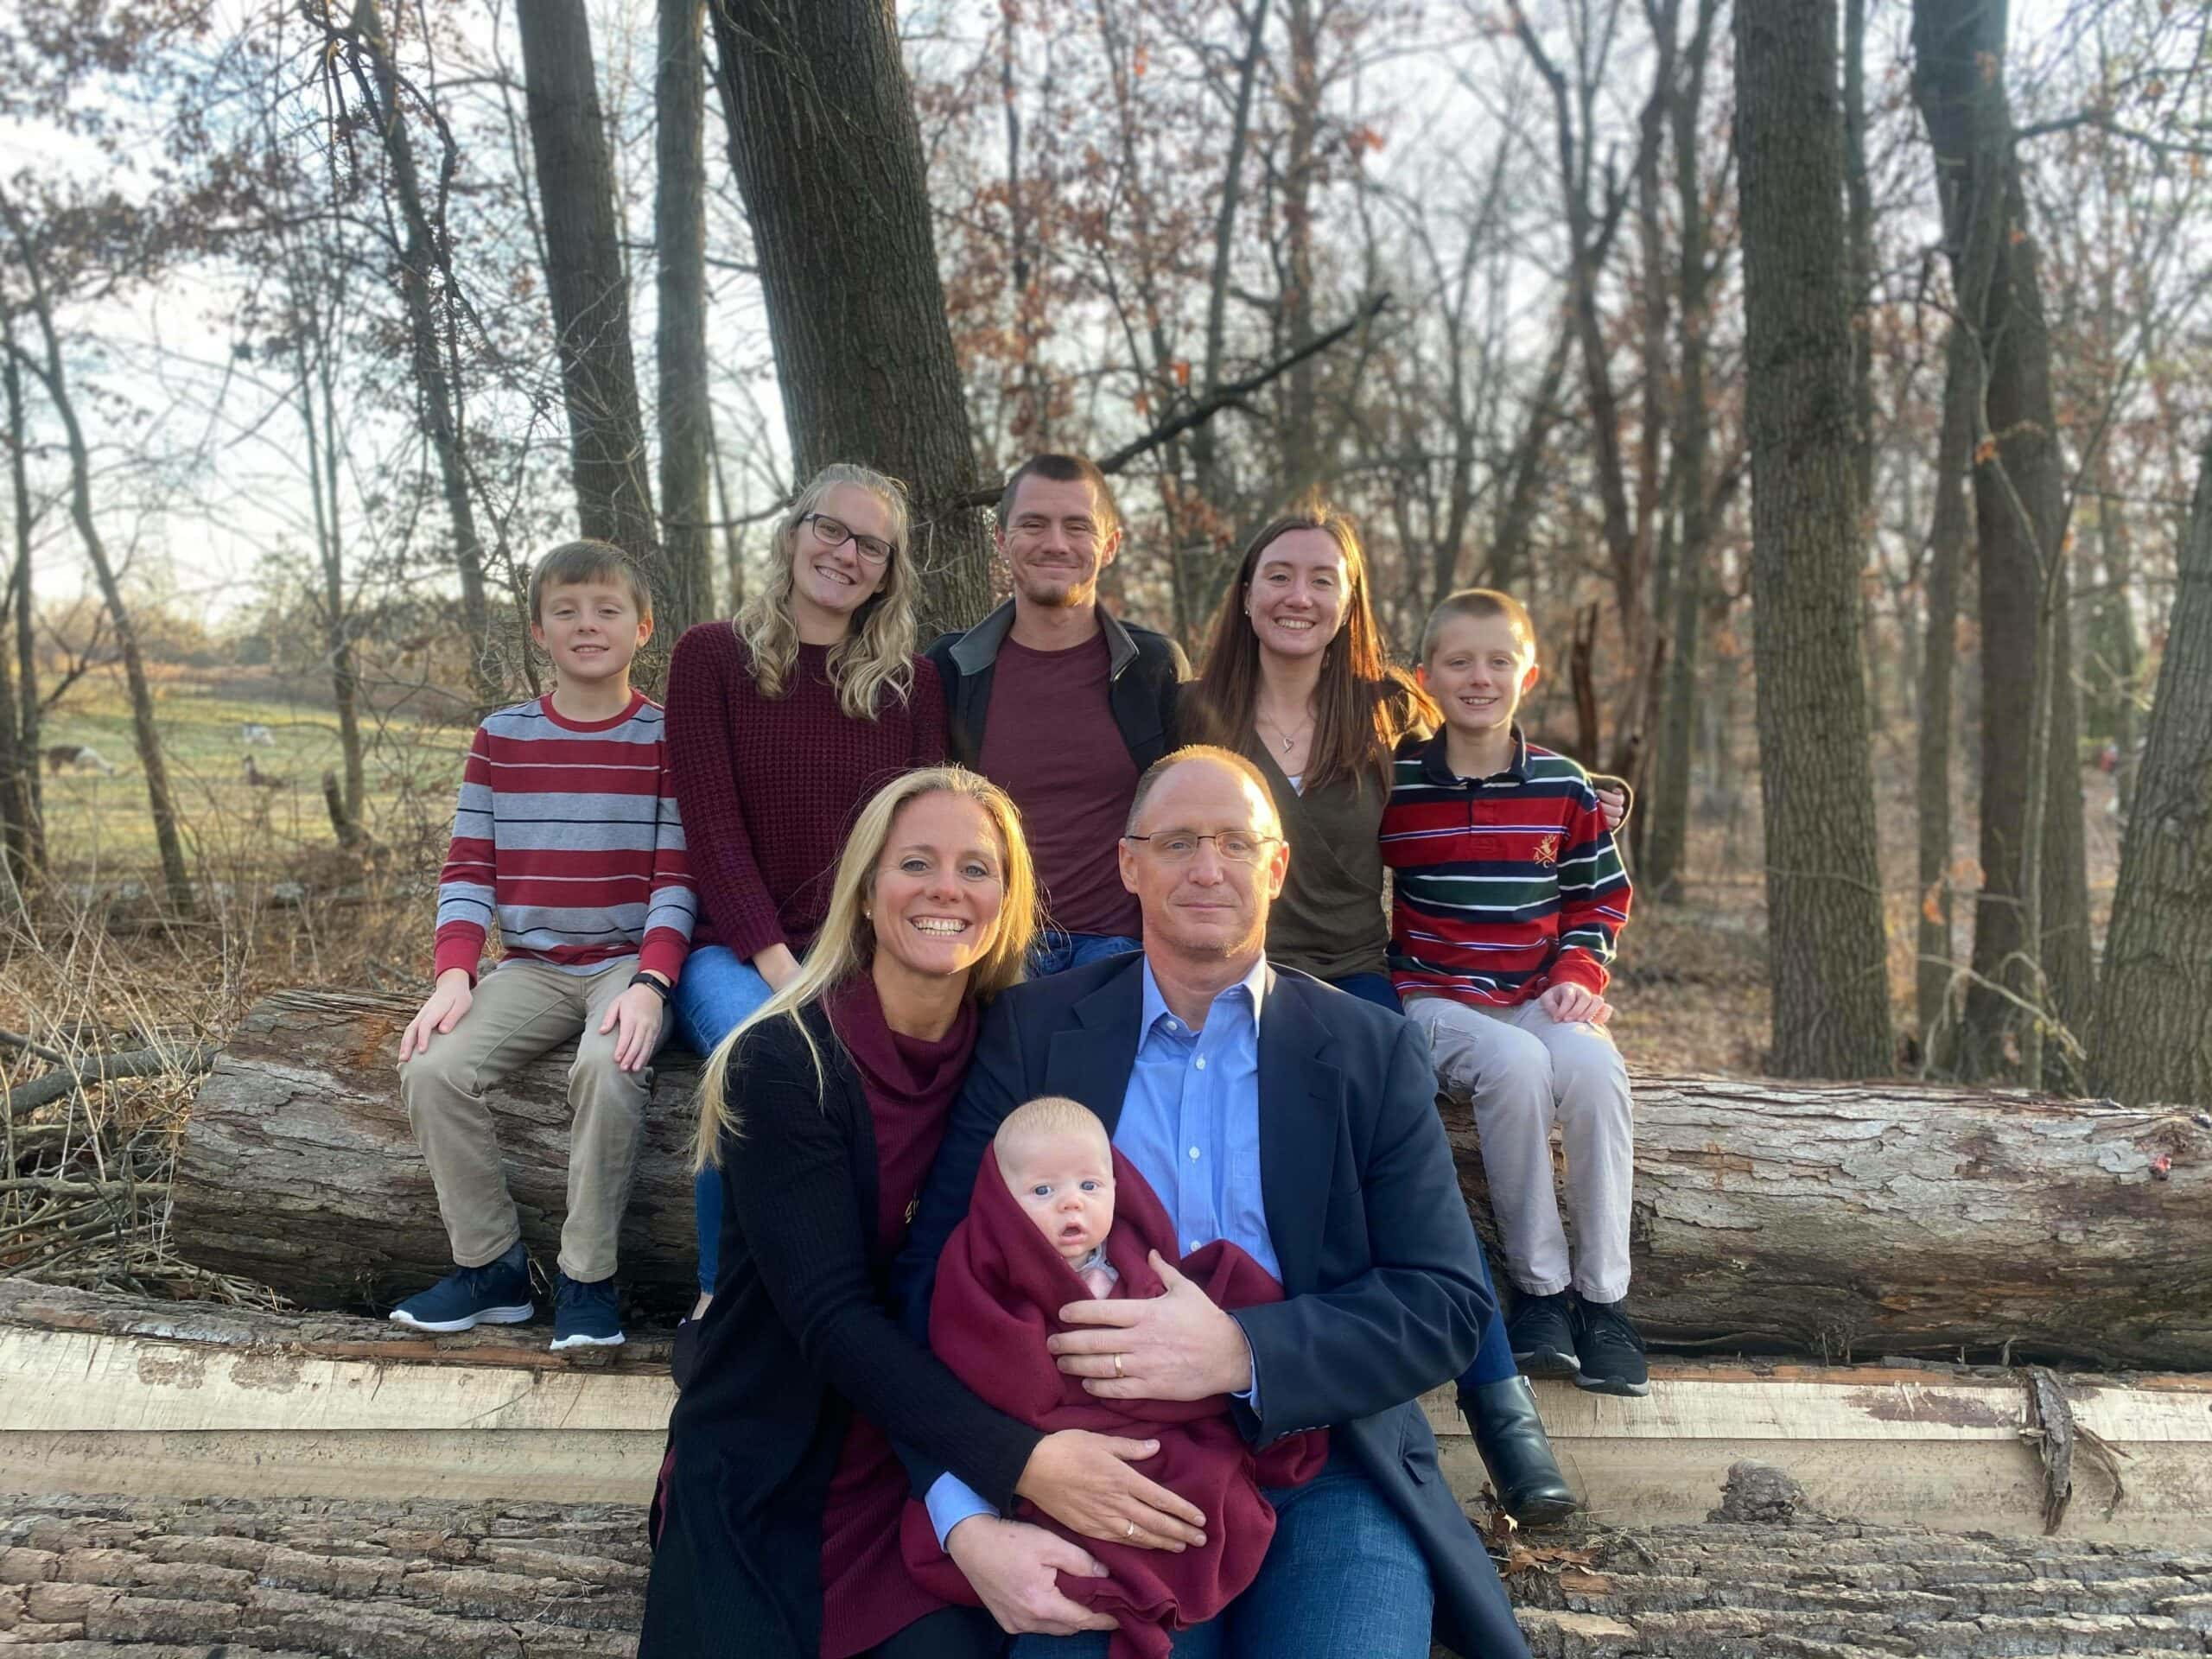 Widup8.family photo